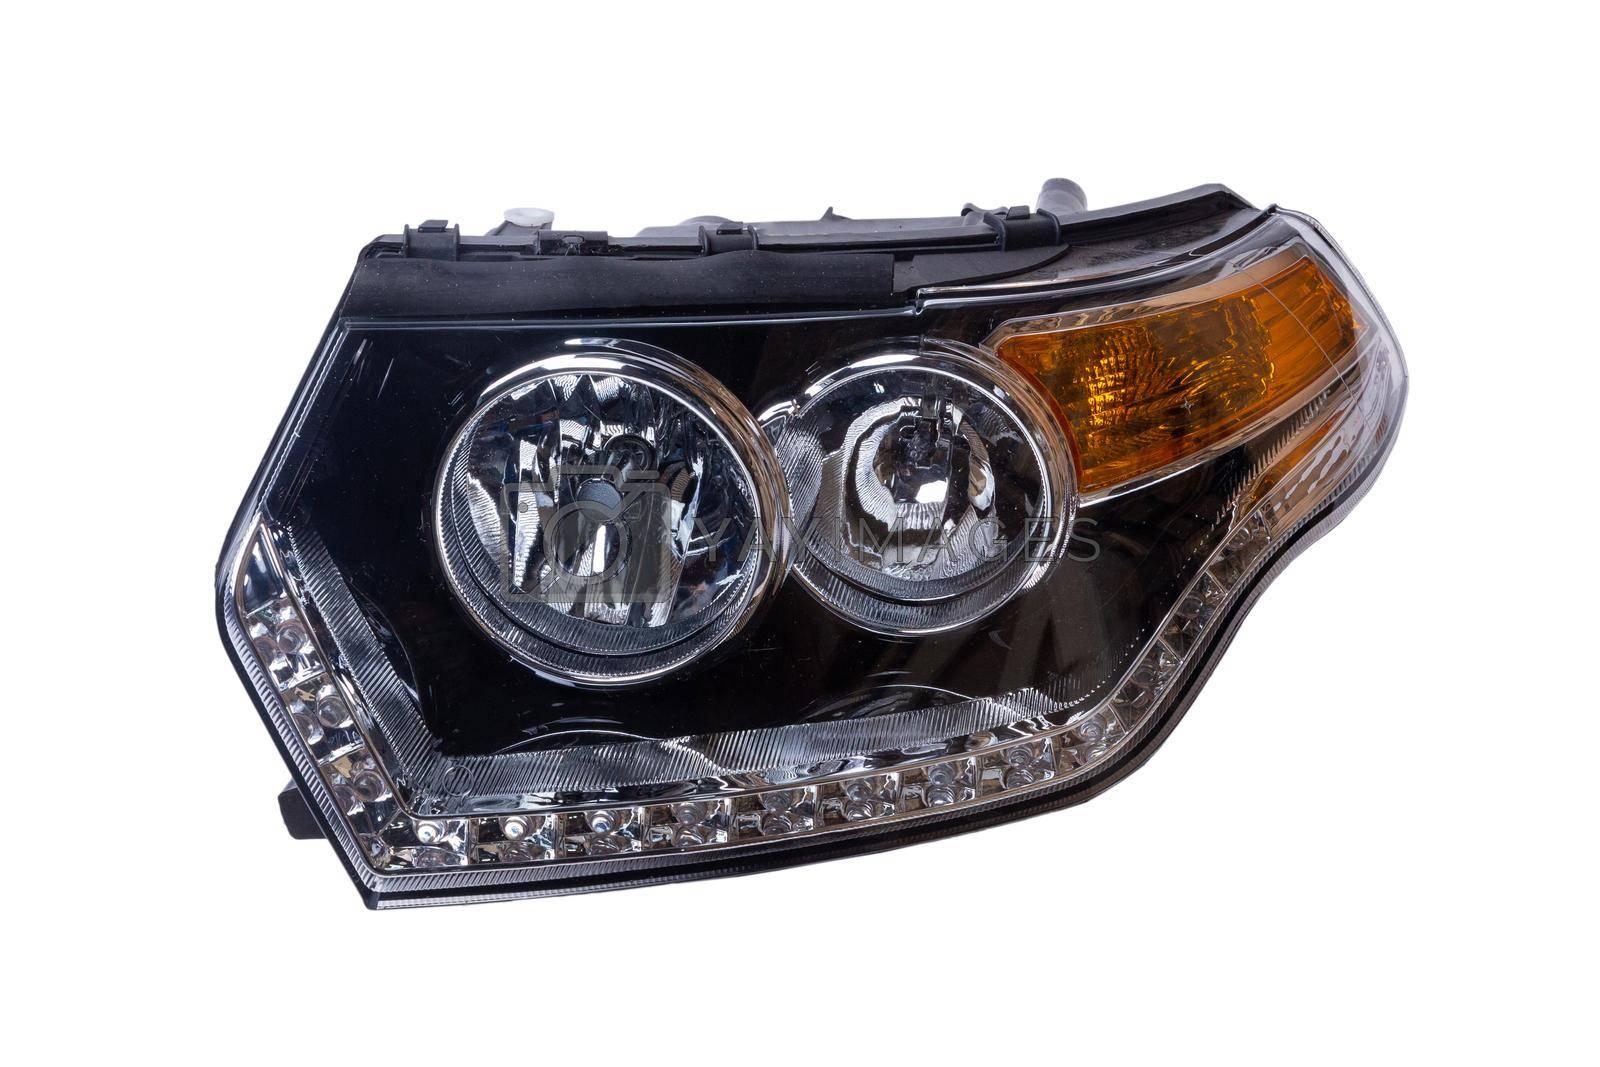 Car headlight isolated on white background.